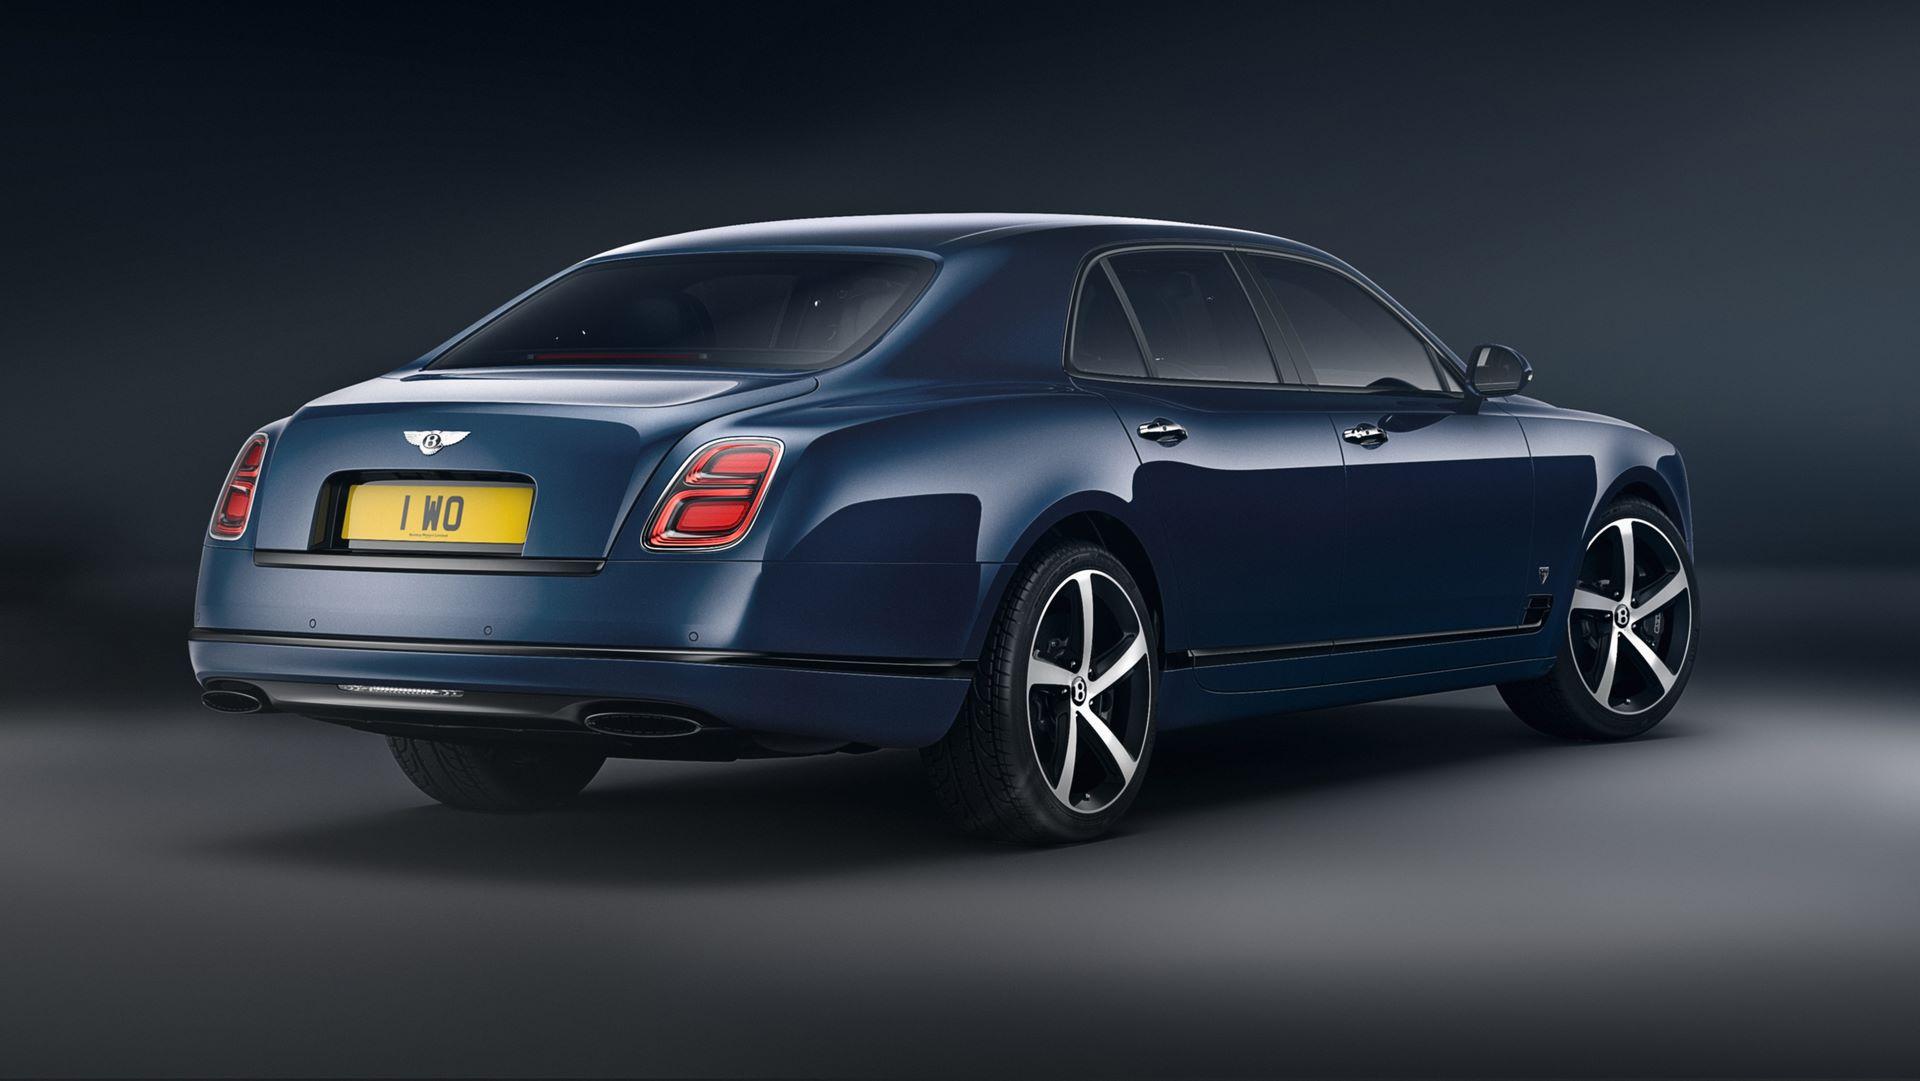 Bentley-Mulsanne-6.75-Edition-By-Mulliner-3